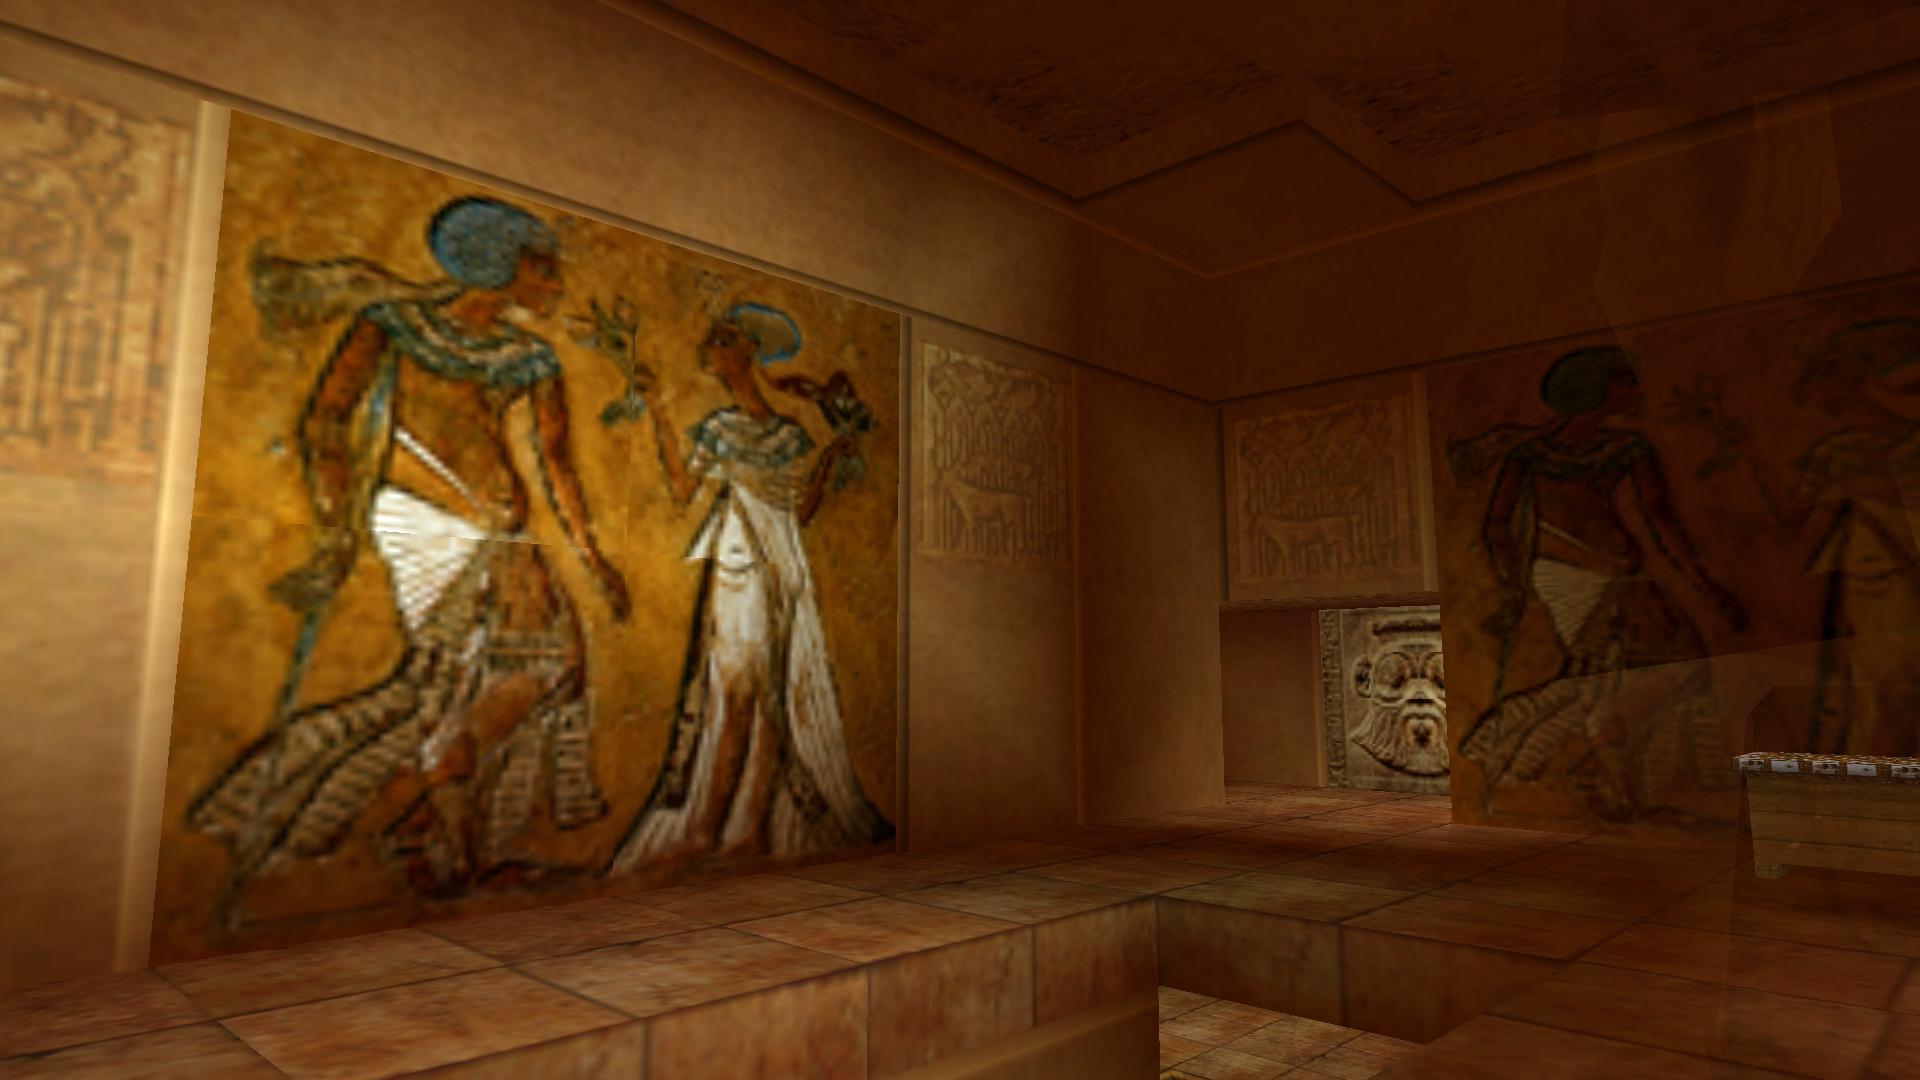 Tomb Raider 4 - Cleopatras Palaces Original